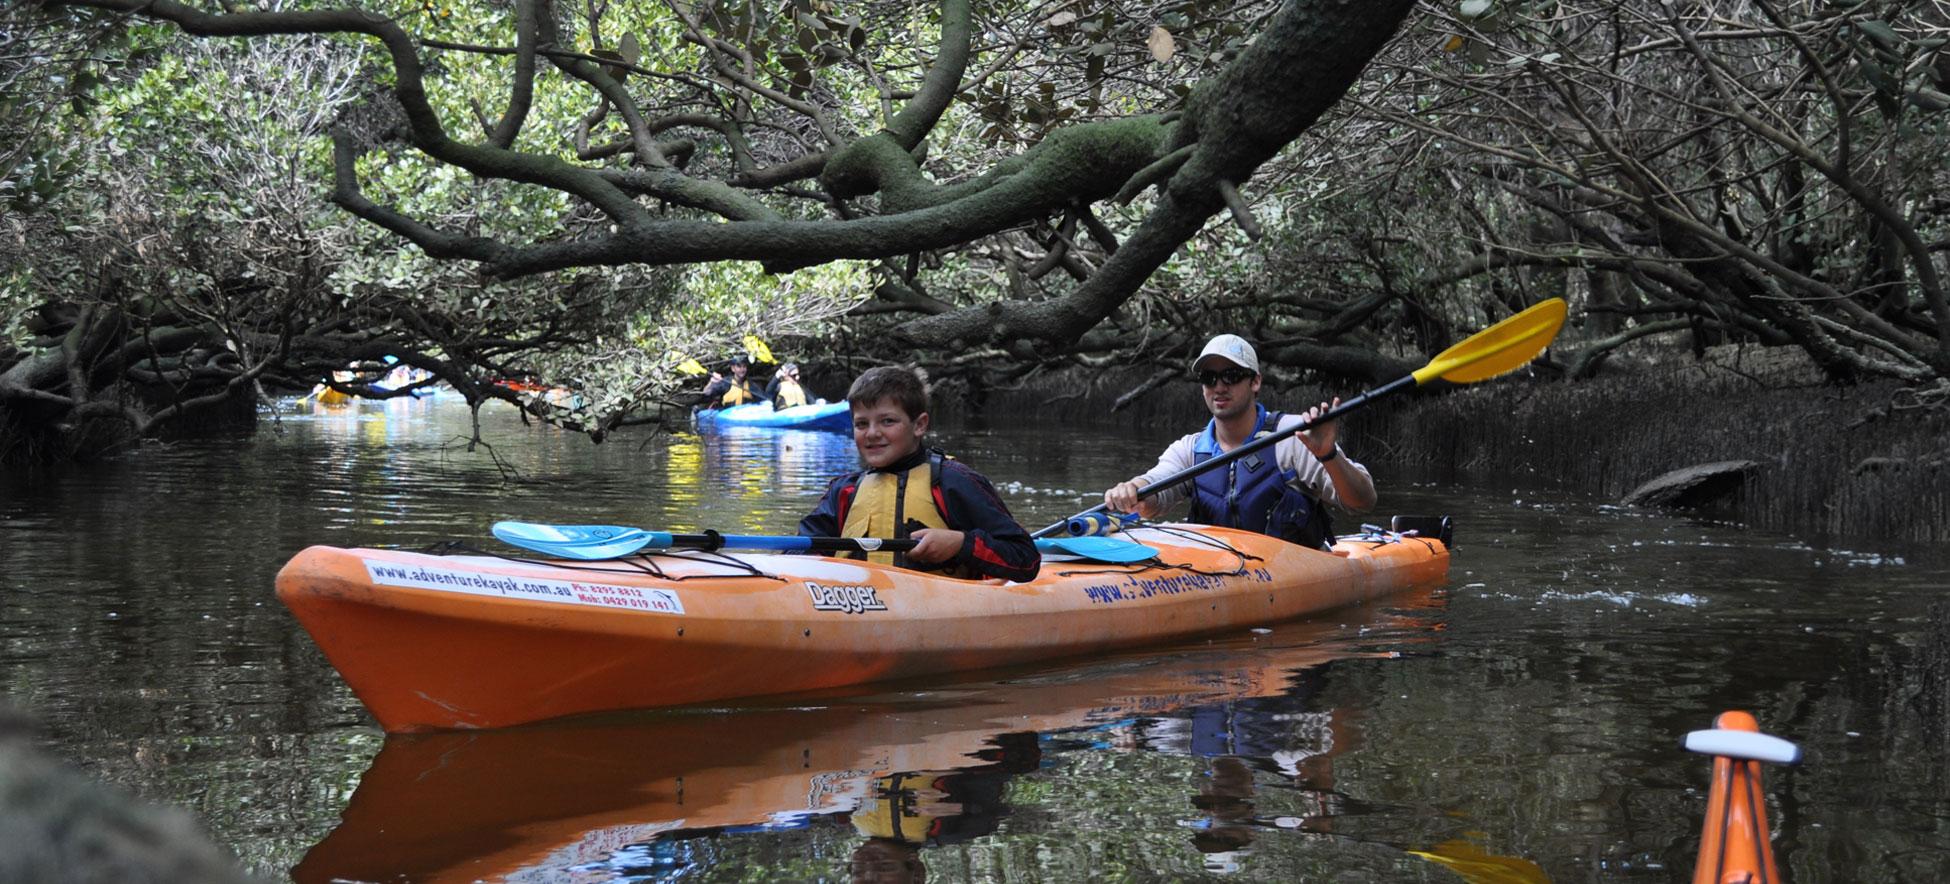 Adventure Kayak Sa Adventure Kayaking Kayak Tours Port River